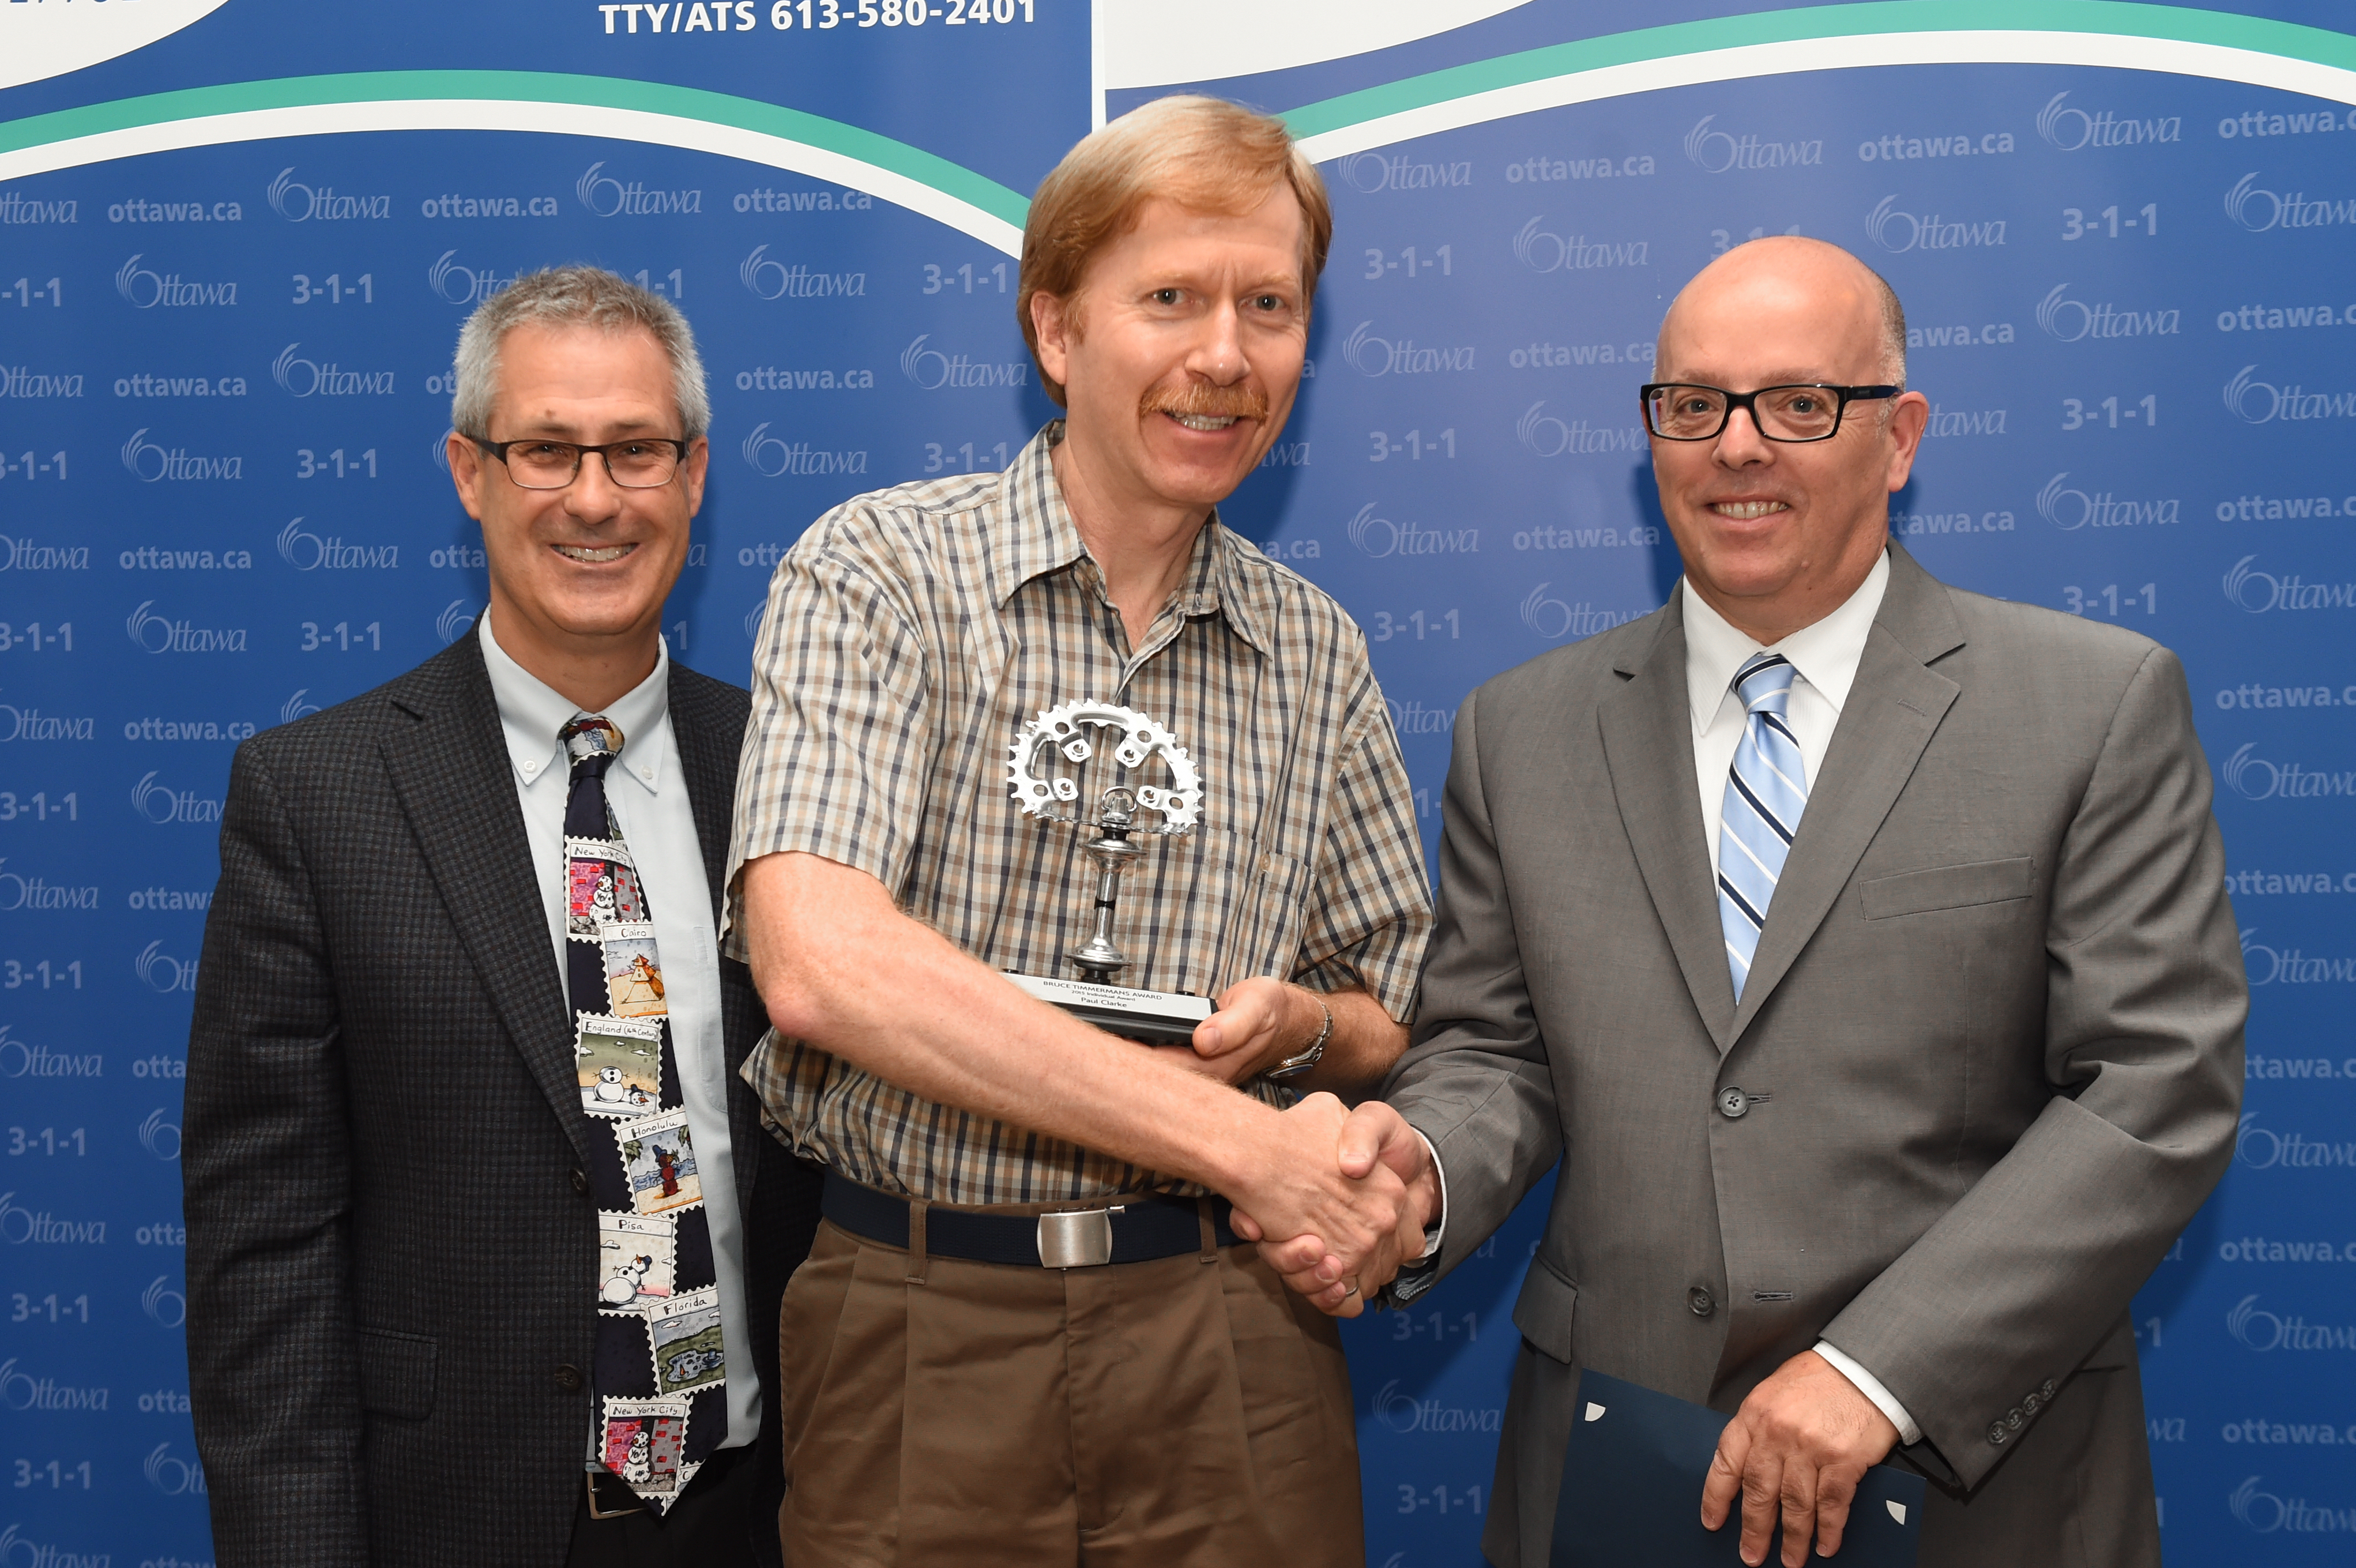 Picture of Paul Clarke, Keith Egli and Michael Mizzi